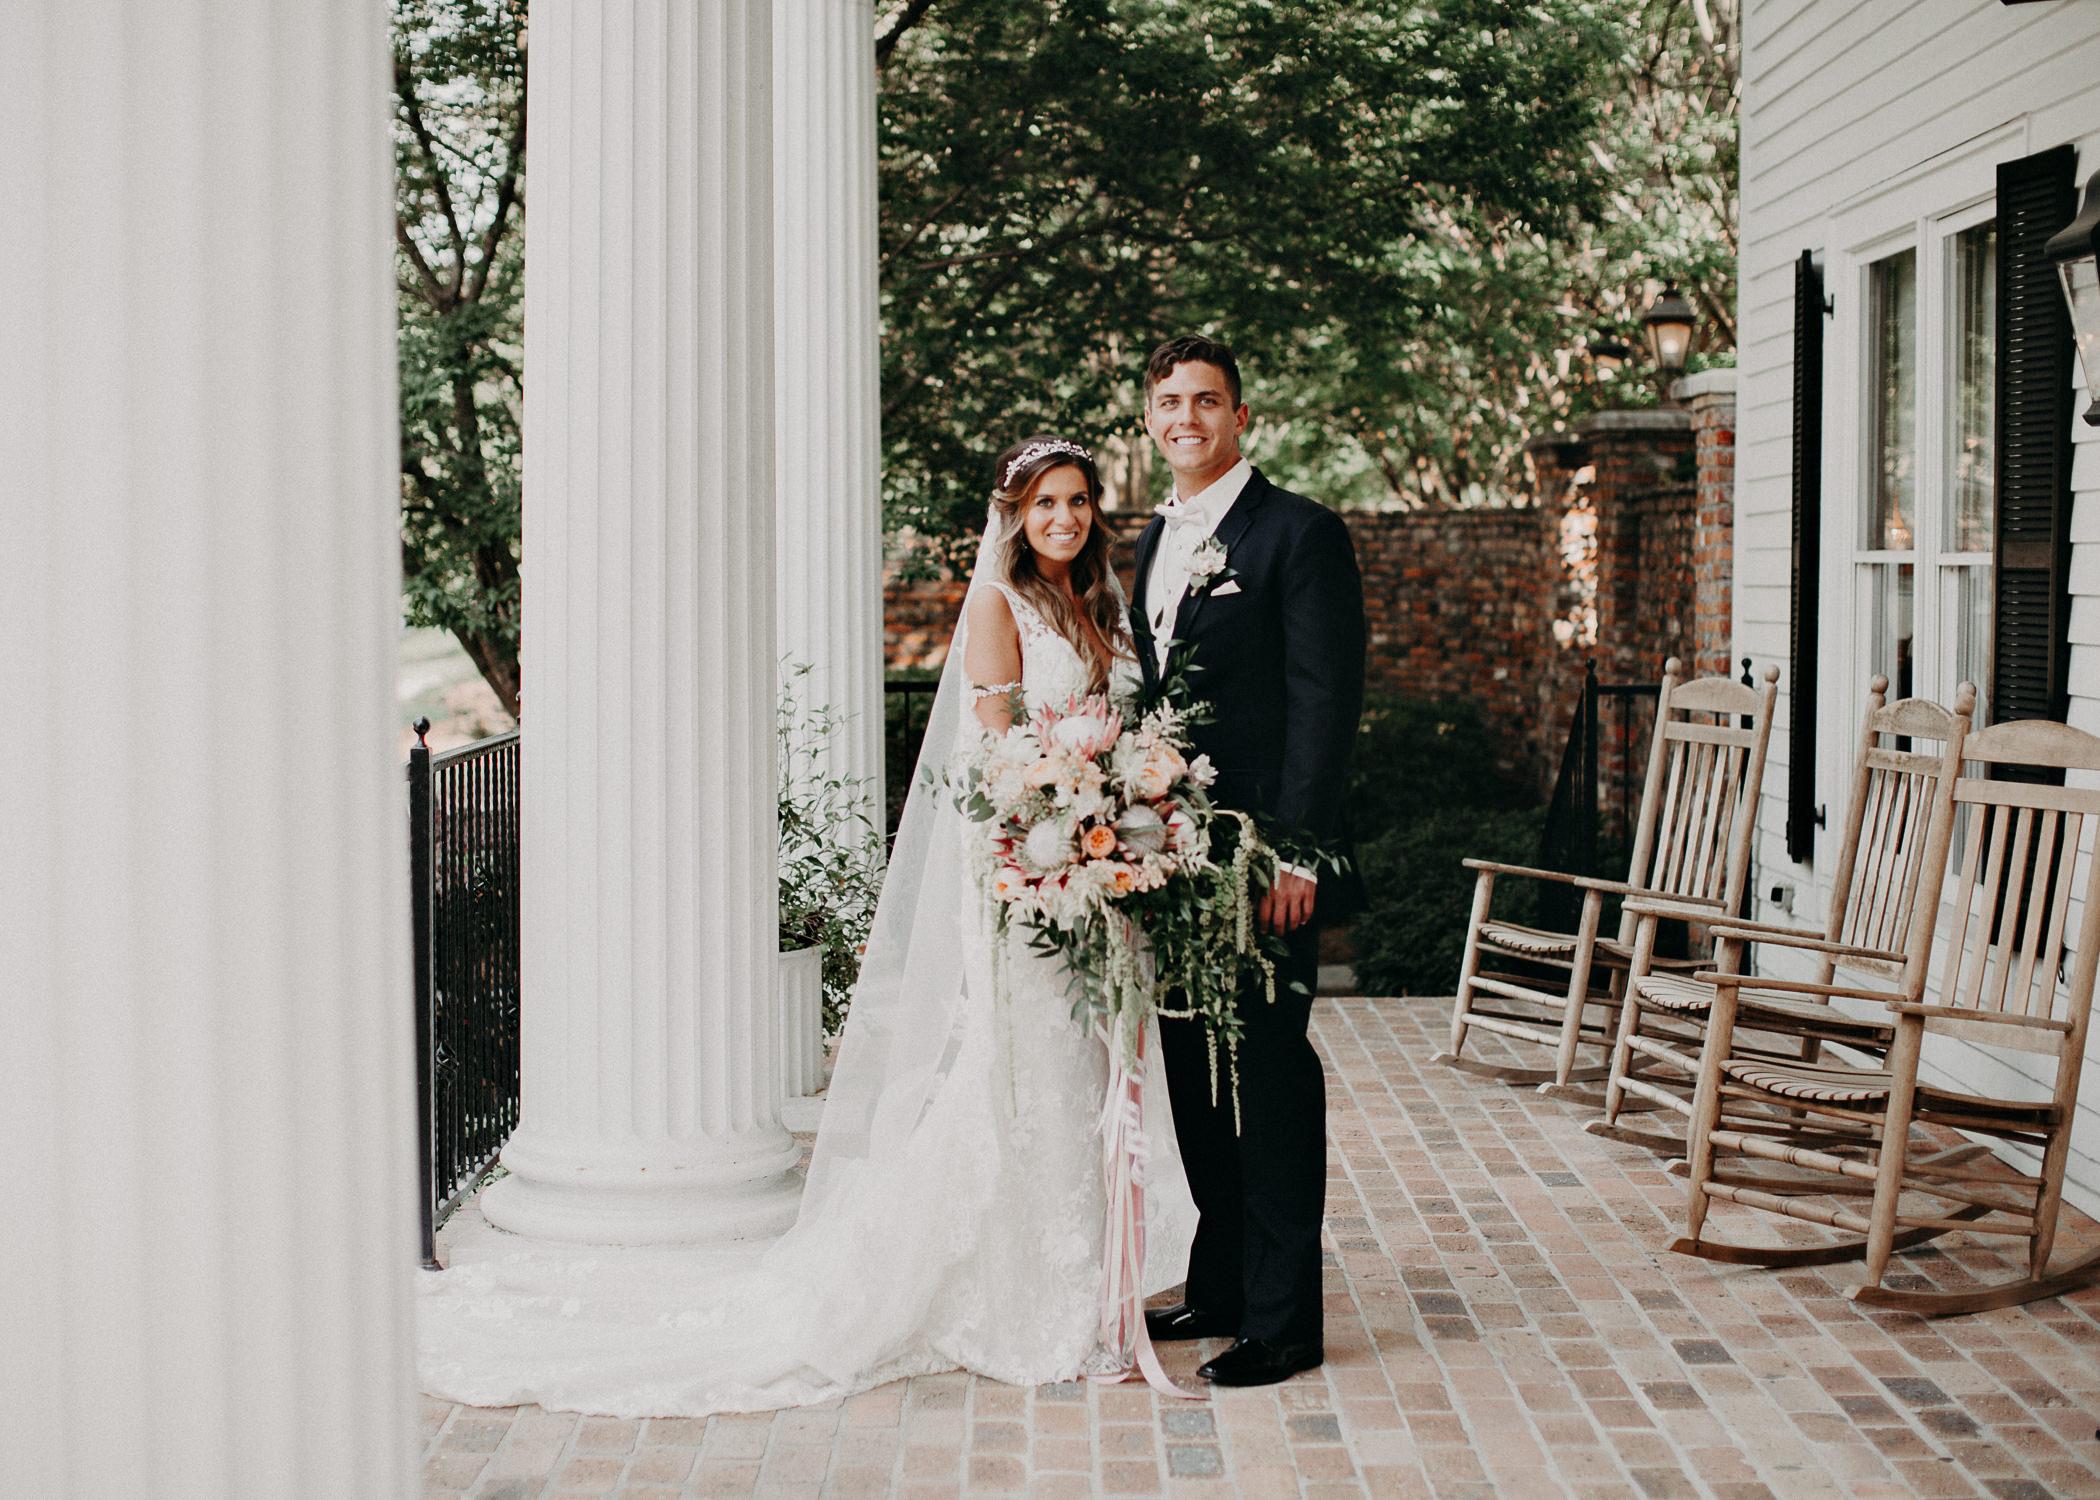 56Carl House Wedding Venue Ga, Atlanta Wedding Photographer - Boho, Bohemian, Junebug Weddings, Vintage, Retro, Trendy. Aline Marin Photography. .jpg